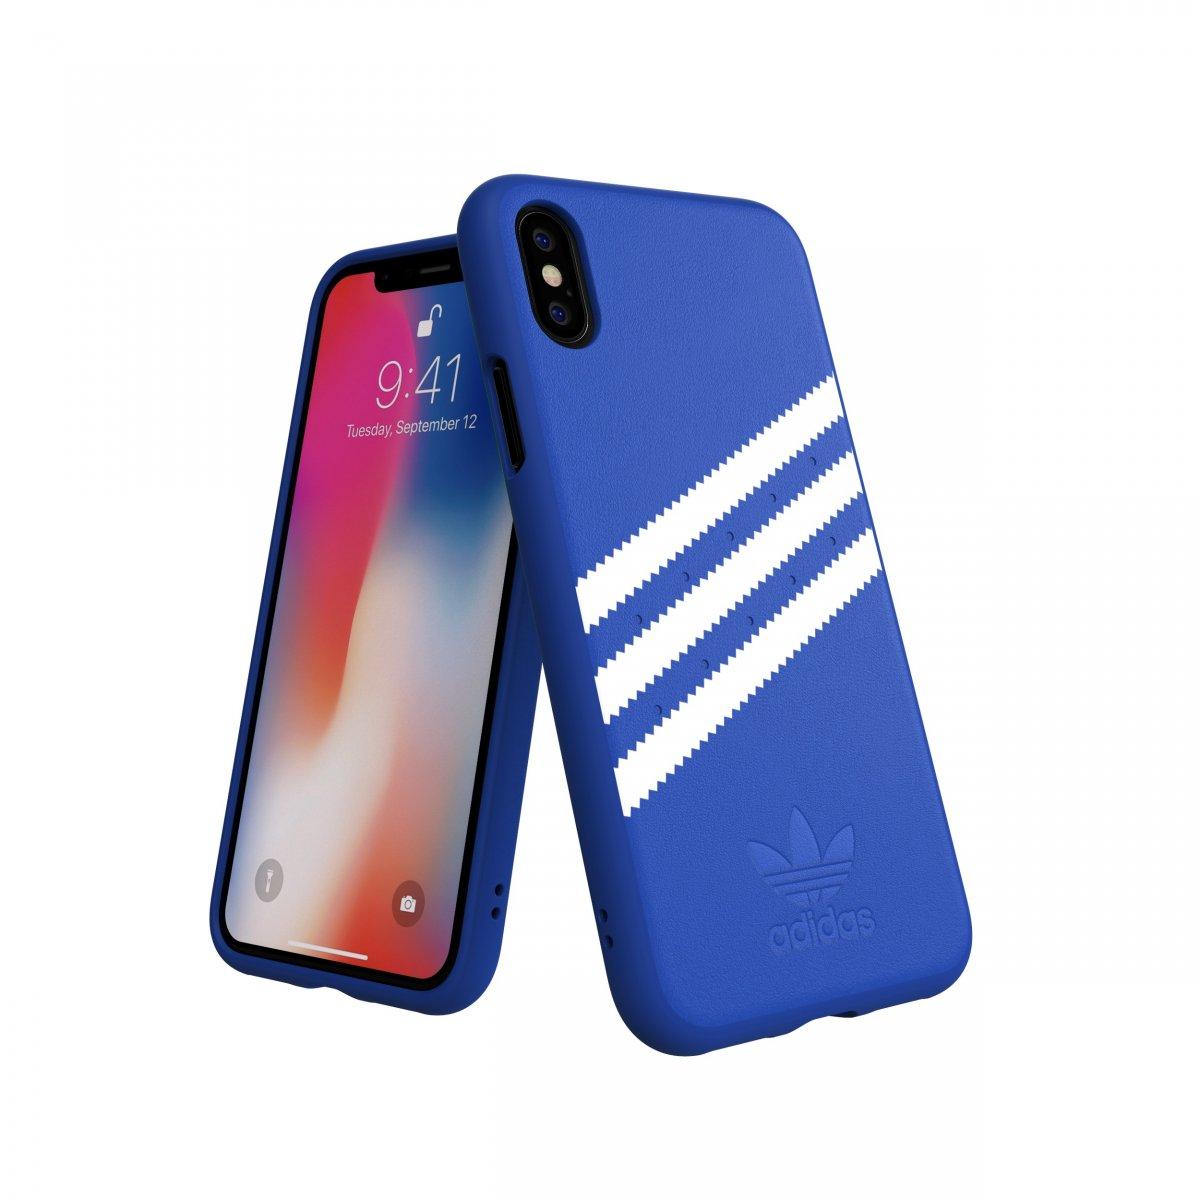 iPhone X/Xs Skal OR Moulded Case Suede FW18 Blå